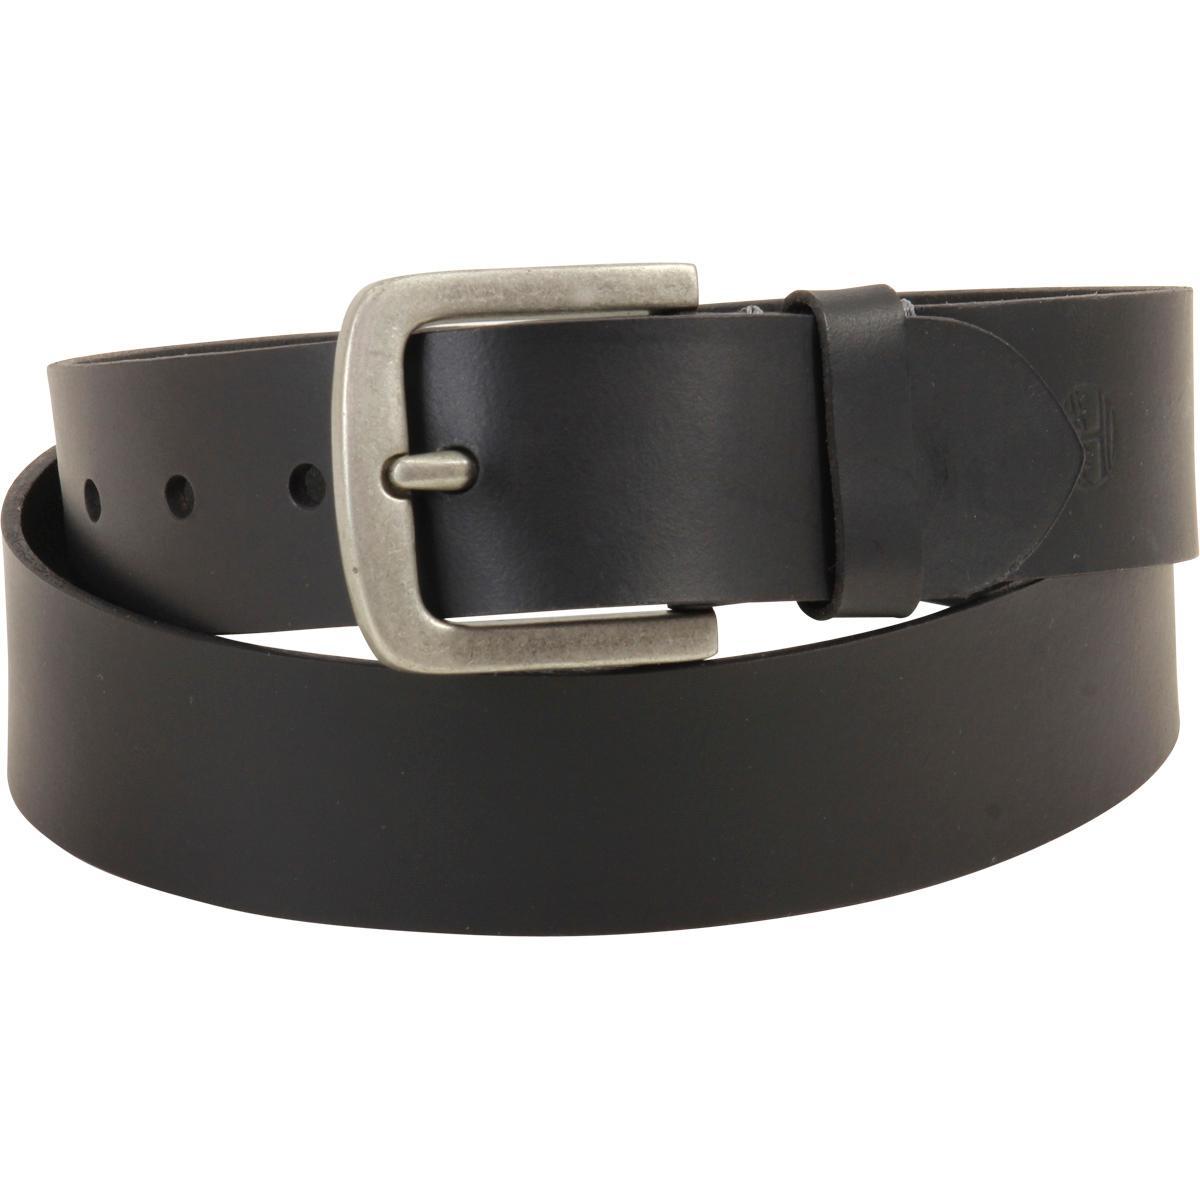 3e5b0b127d2 Timberland Men's Genuine Saddle Leather Belt